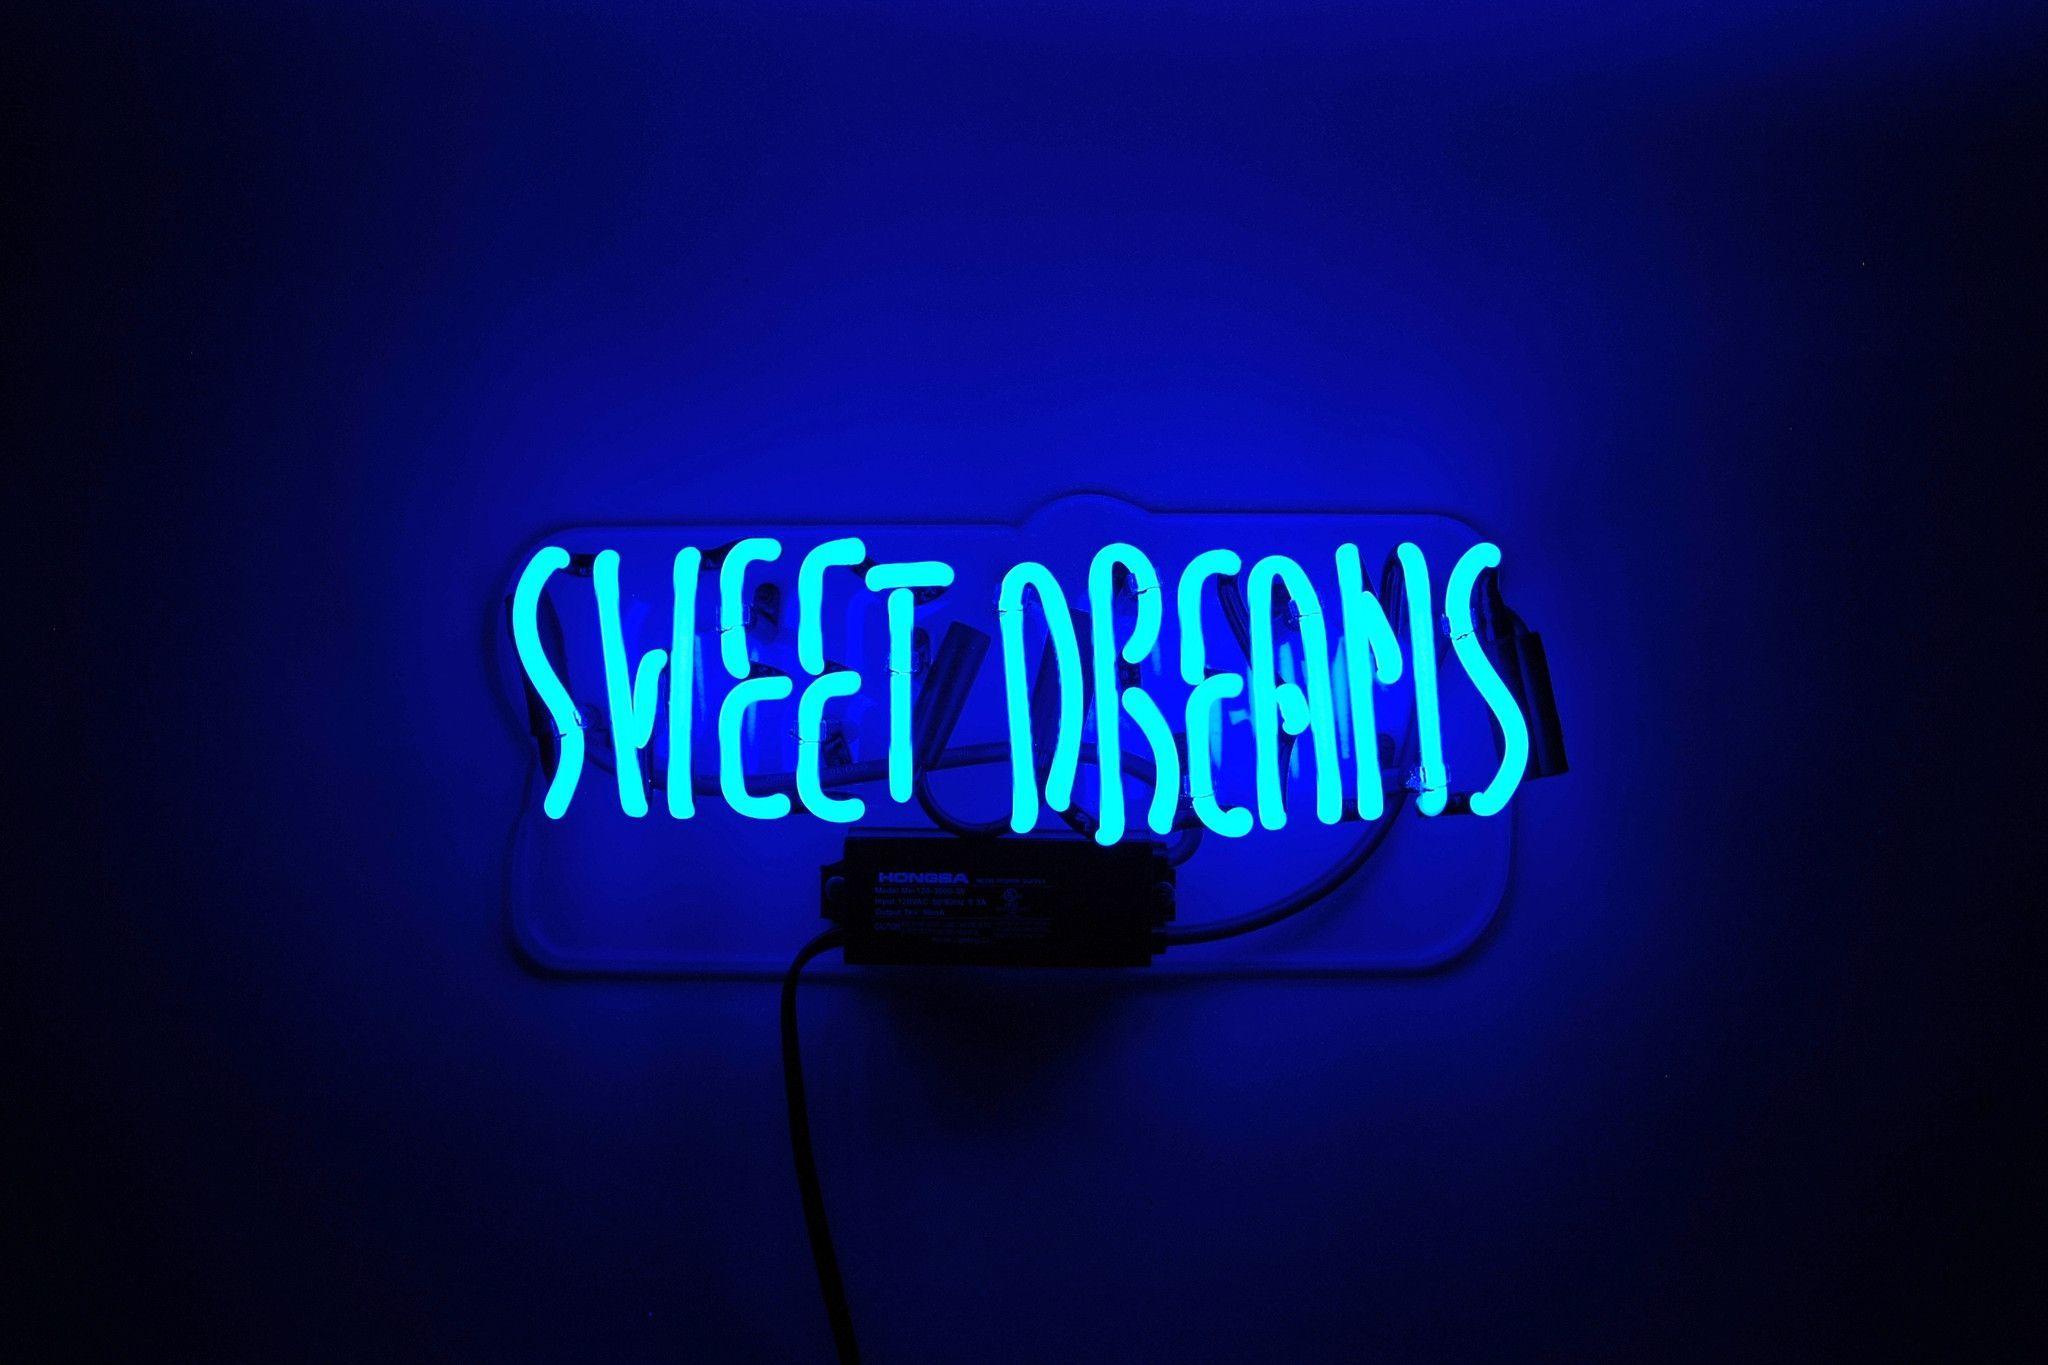 sweet dreams neon sign neon neon lighting and lights. Black Bedroom Furniture Sets. Home Design Ideas